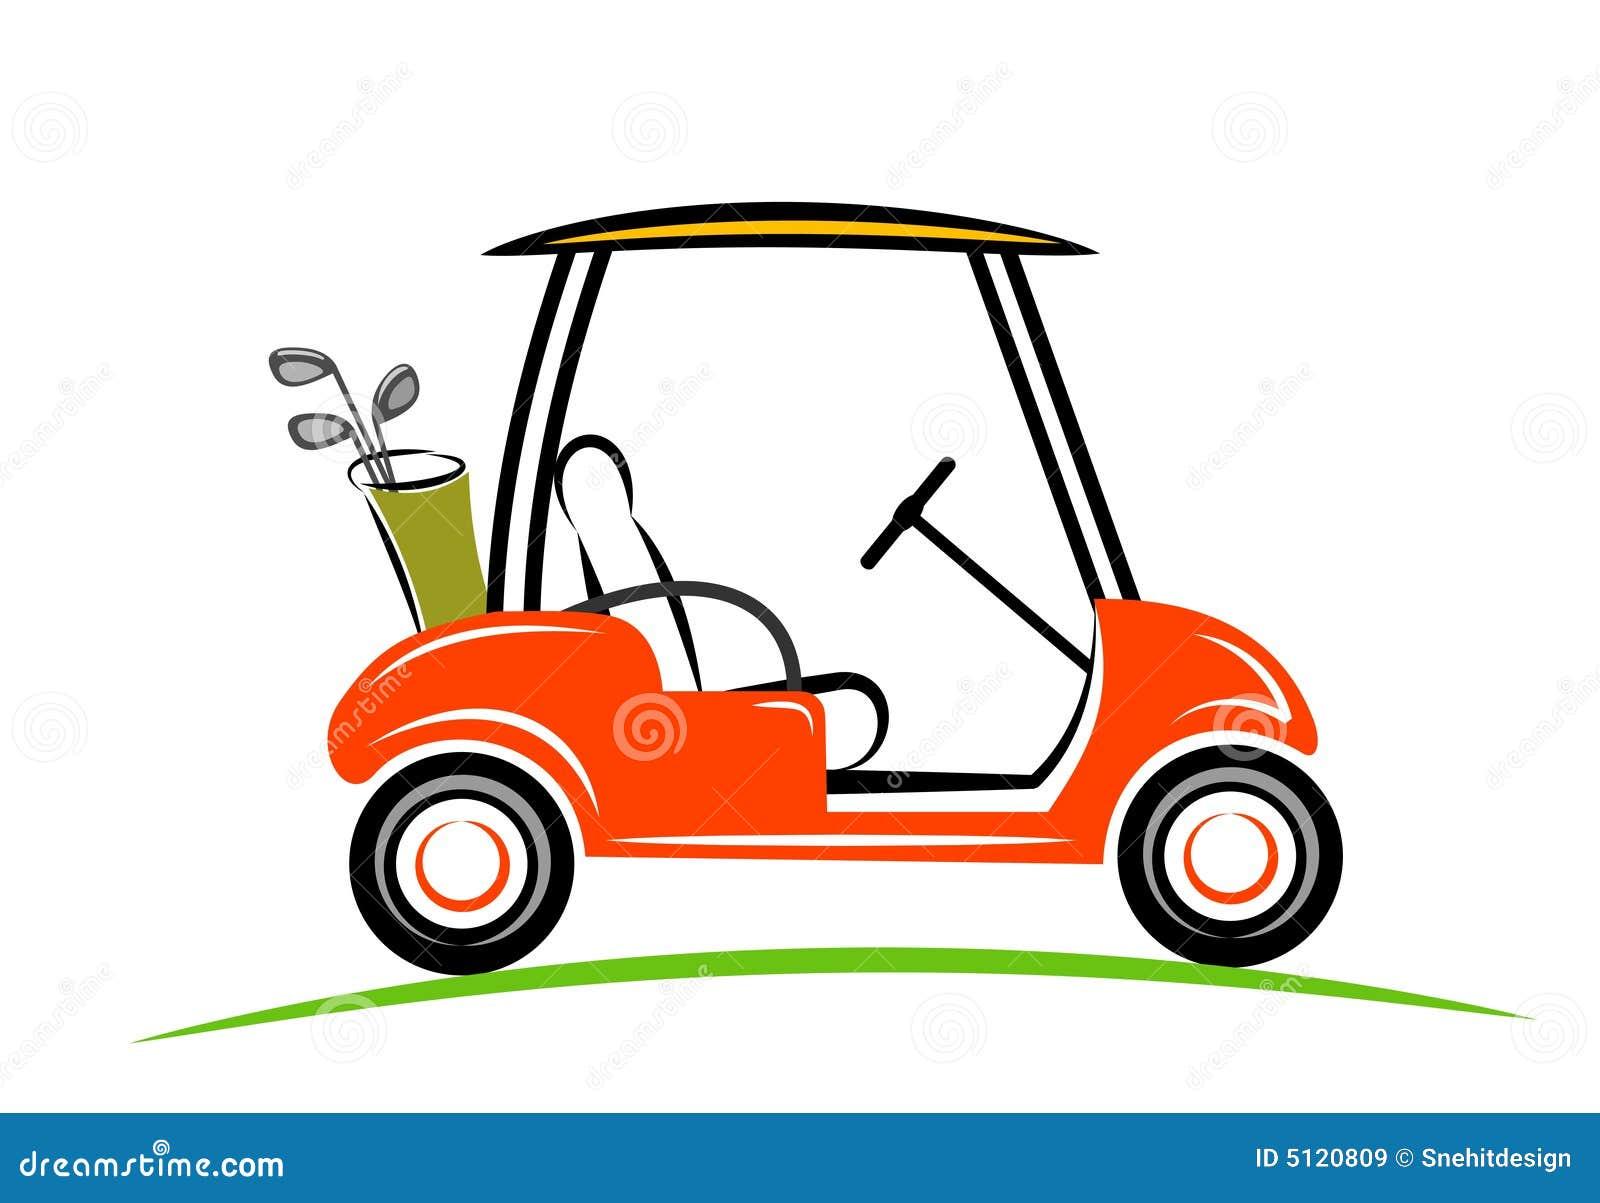 Line Art Car : Line art of golf car royalty free stock images image